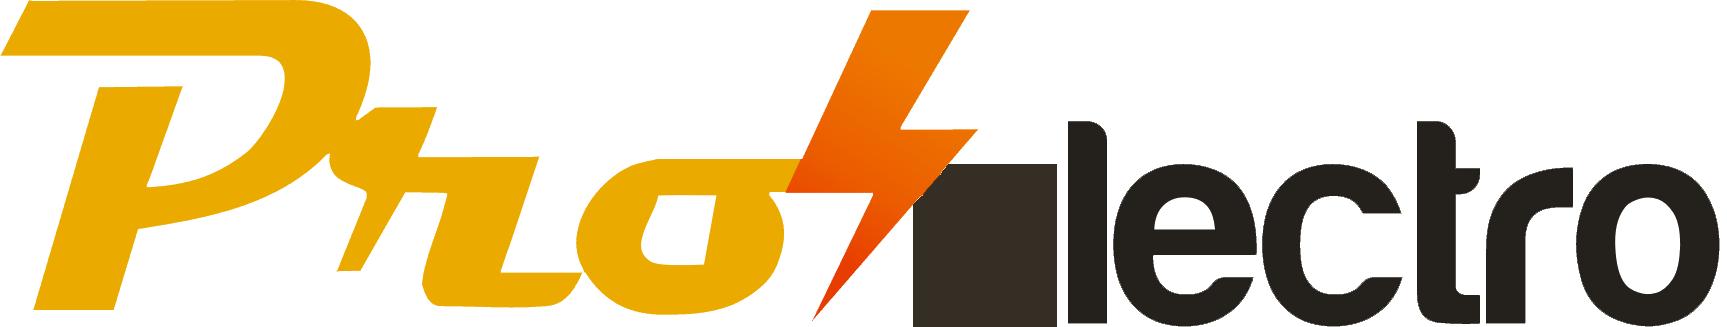 Pro-electro